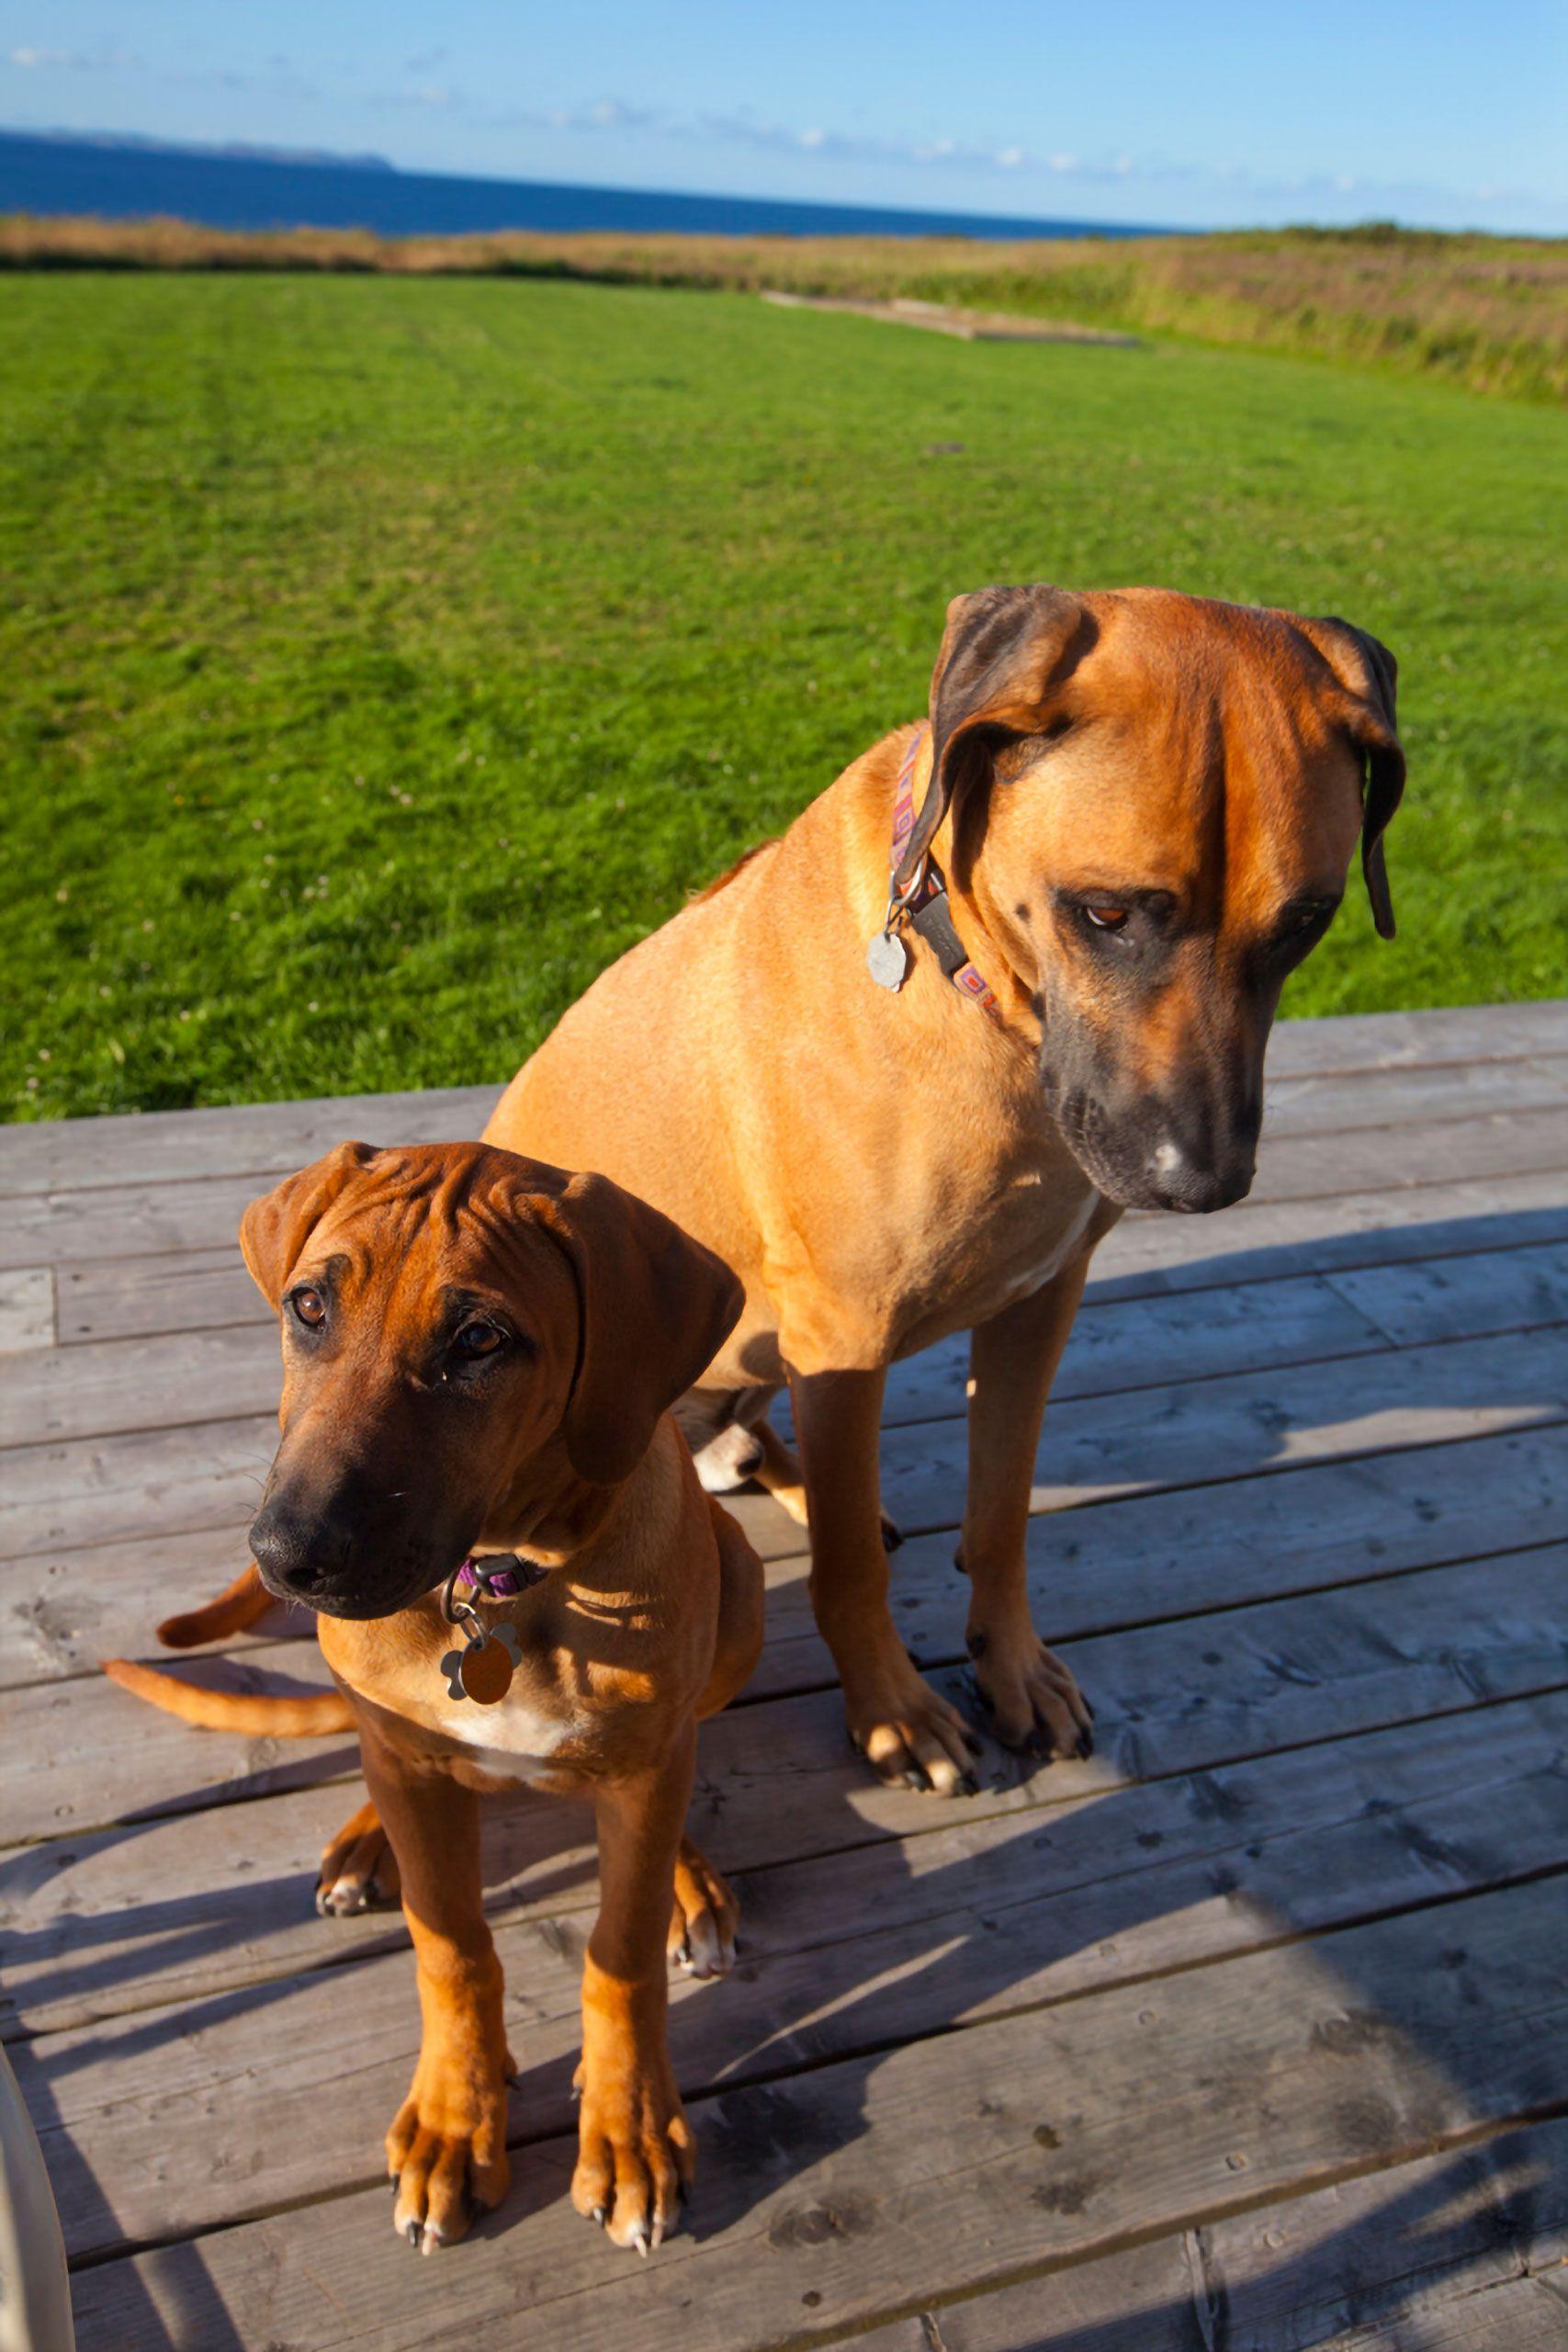 Rhodesian Ridgeback puppy and dog Magdalen Islands Îles de la Madeleine Harve Aubert Quebec Canada